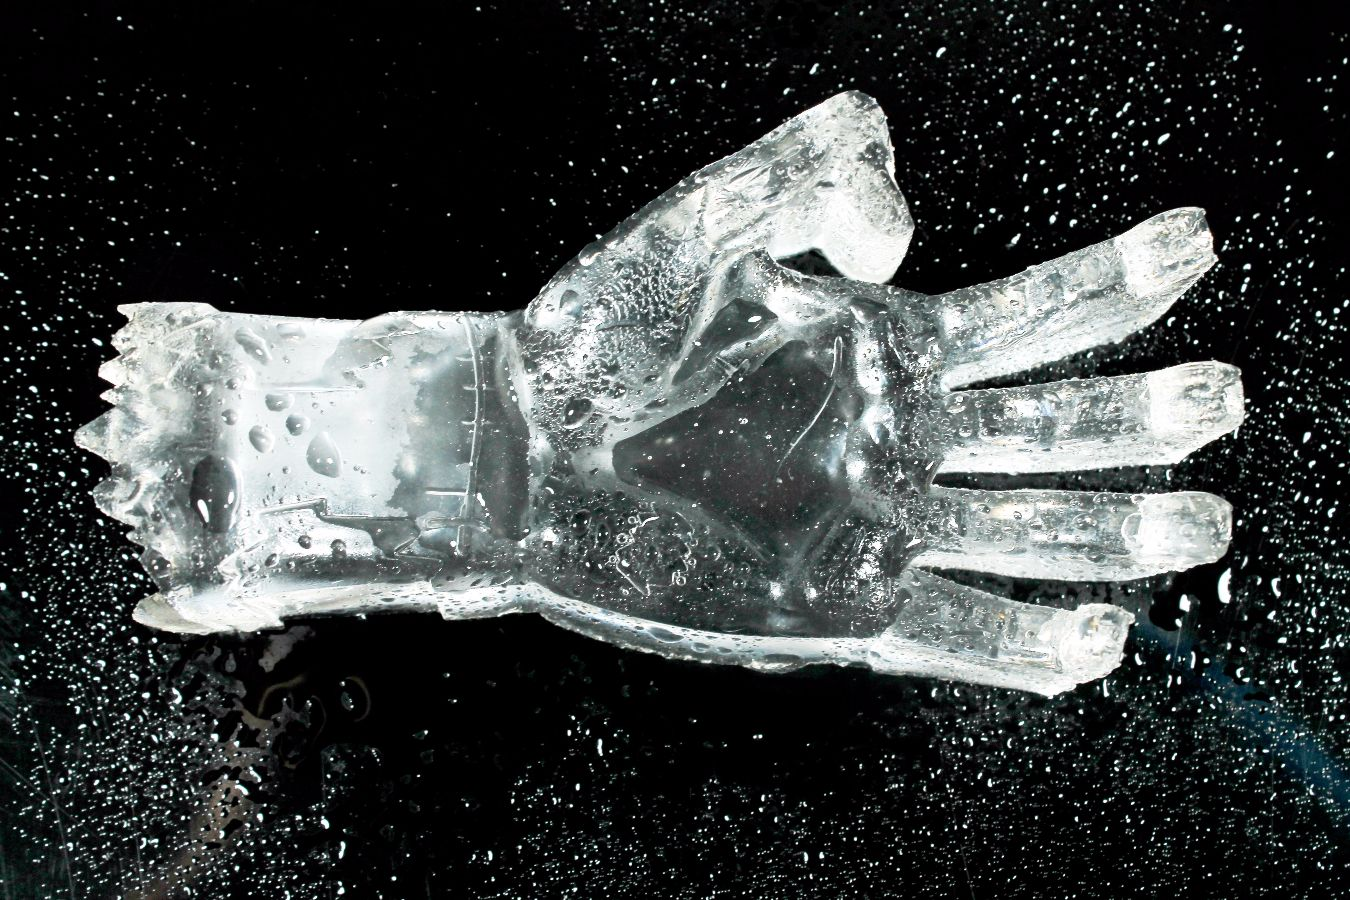 3D Zombie Hand Ice Mold | Kids Go Whoa